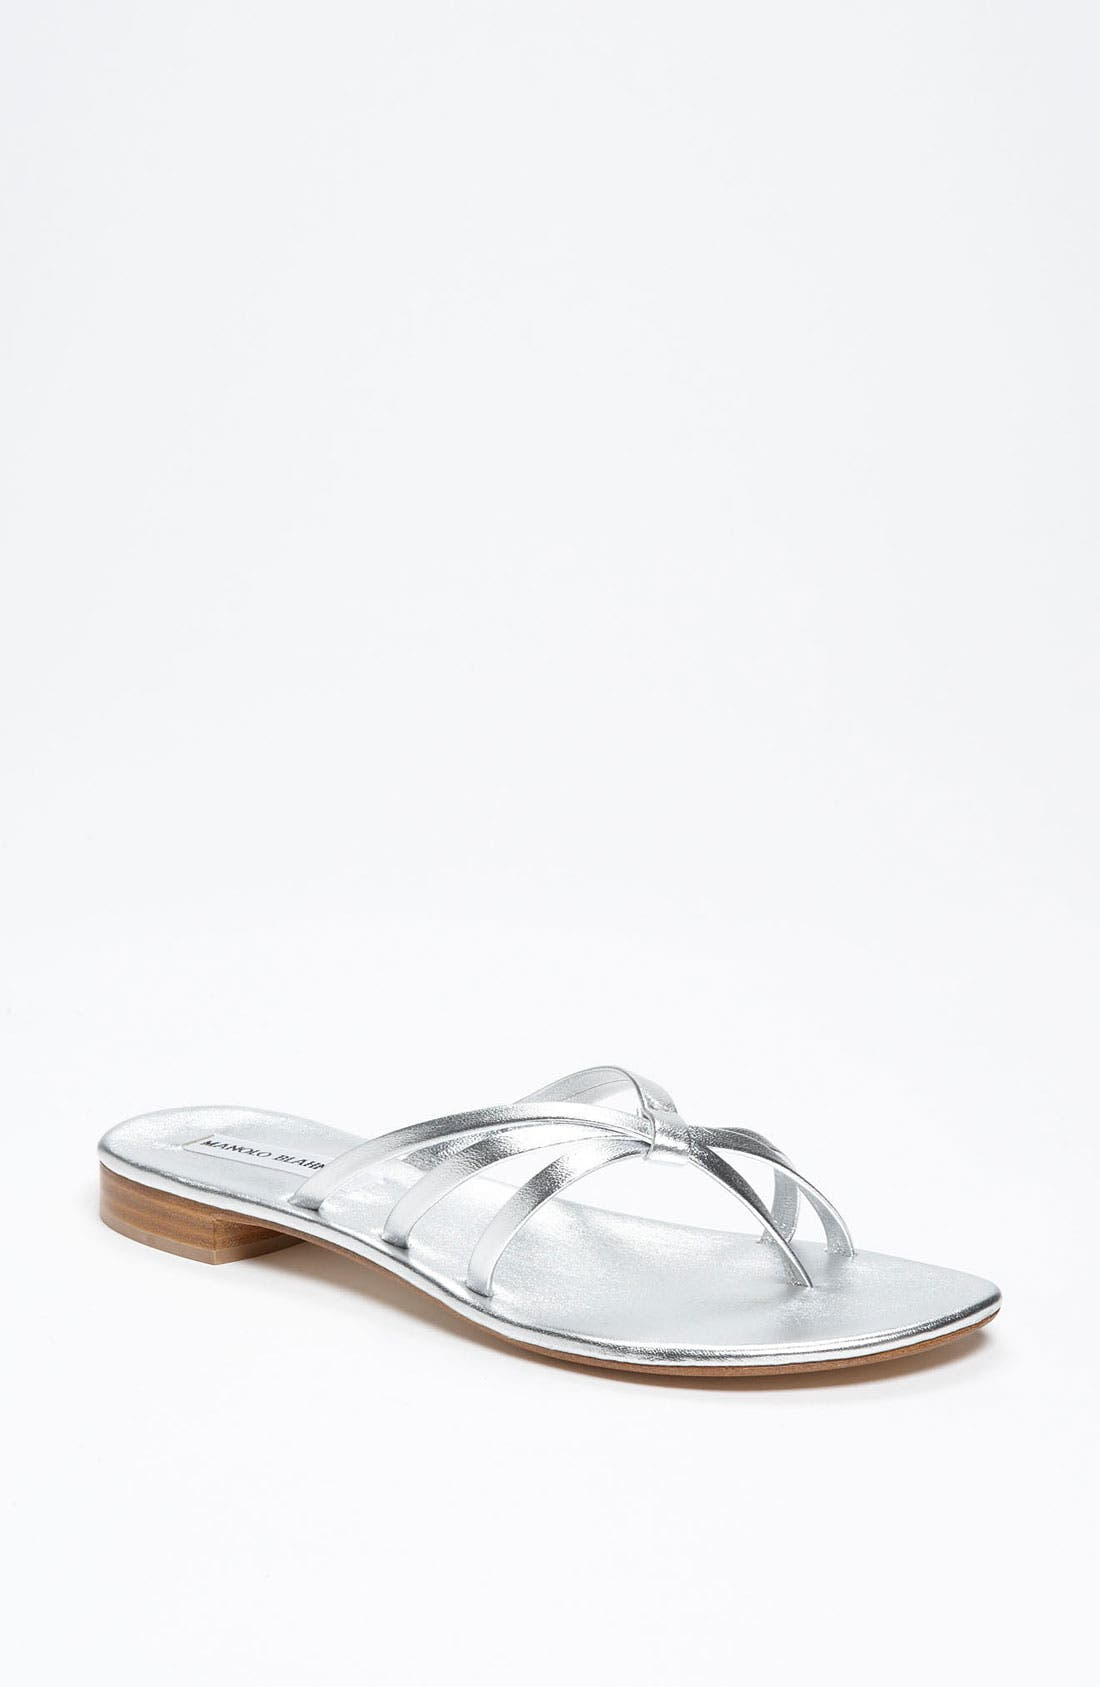 Main Image - Manolo Blahnik 'Winddoka' Sandal